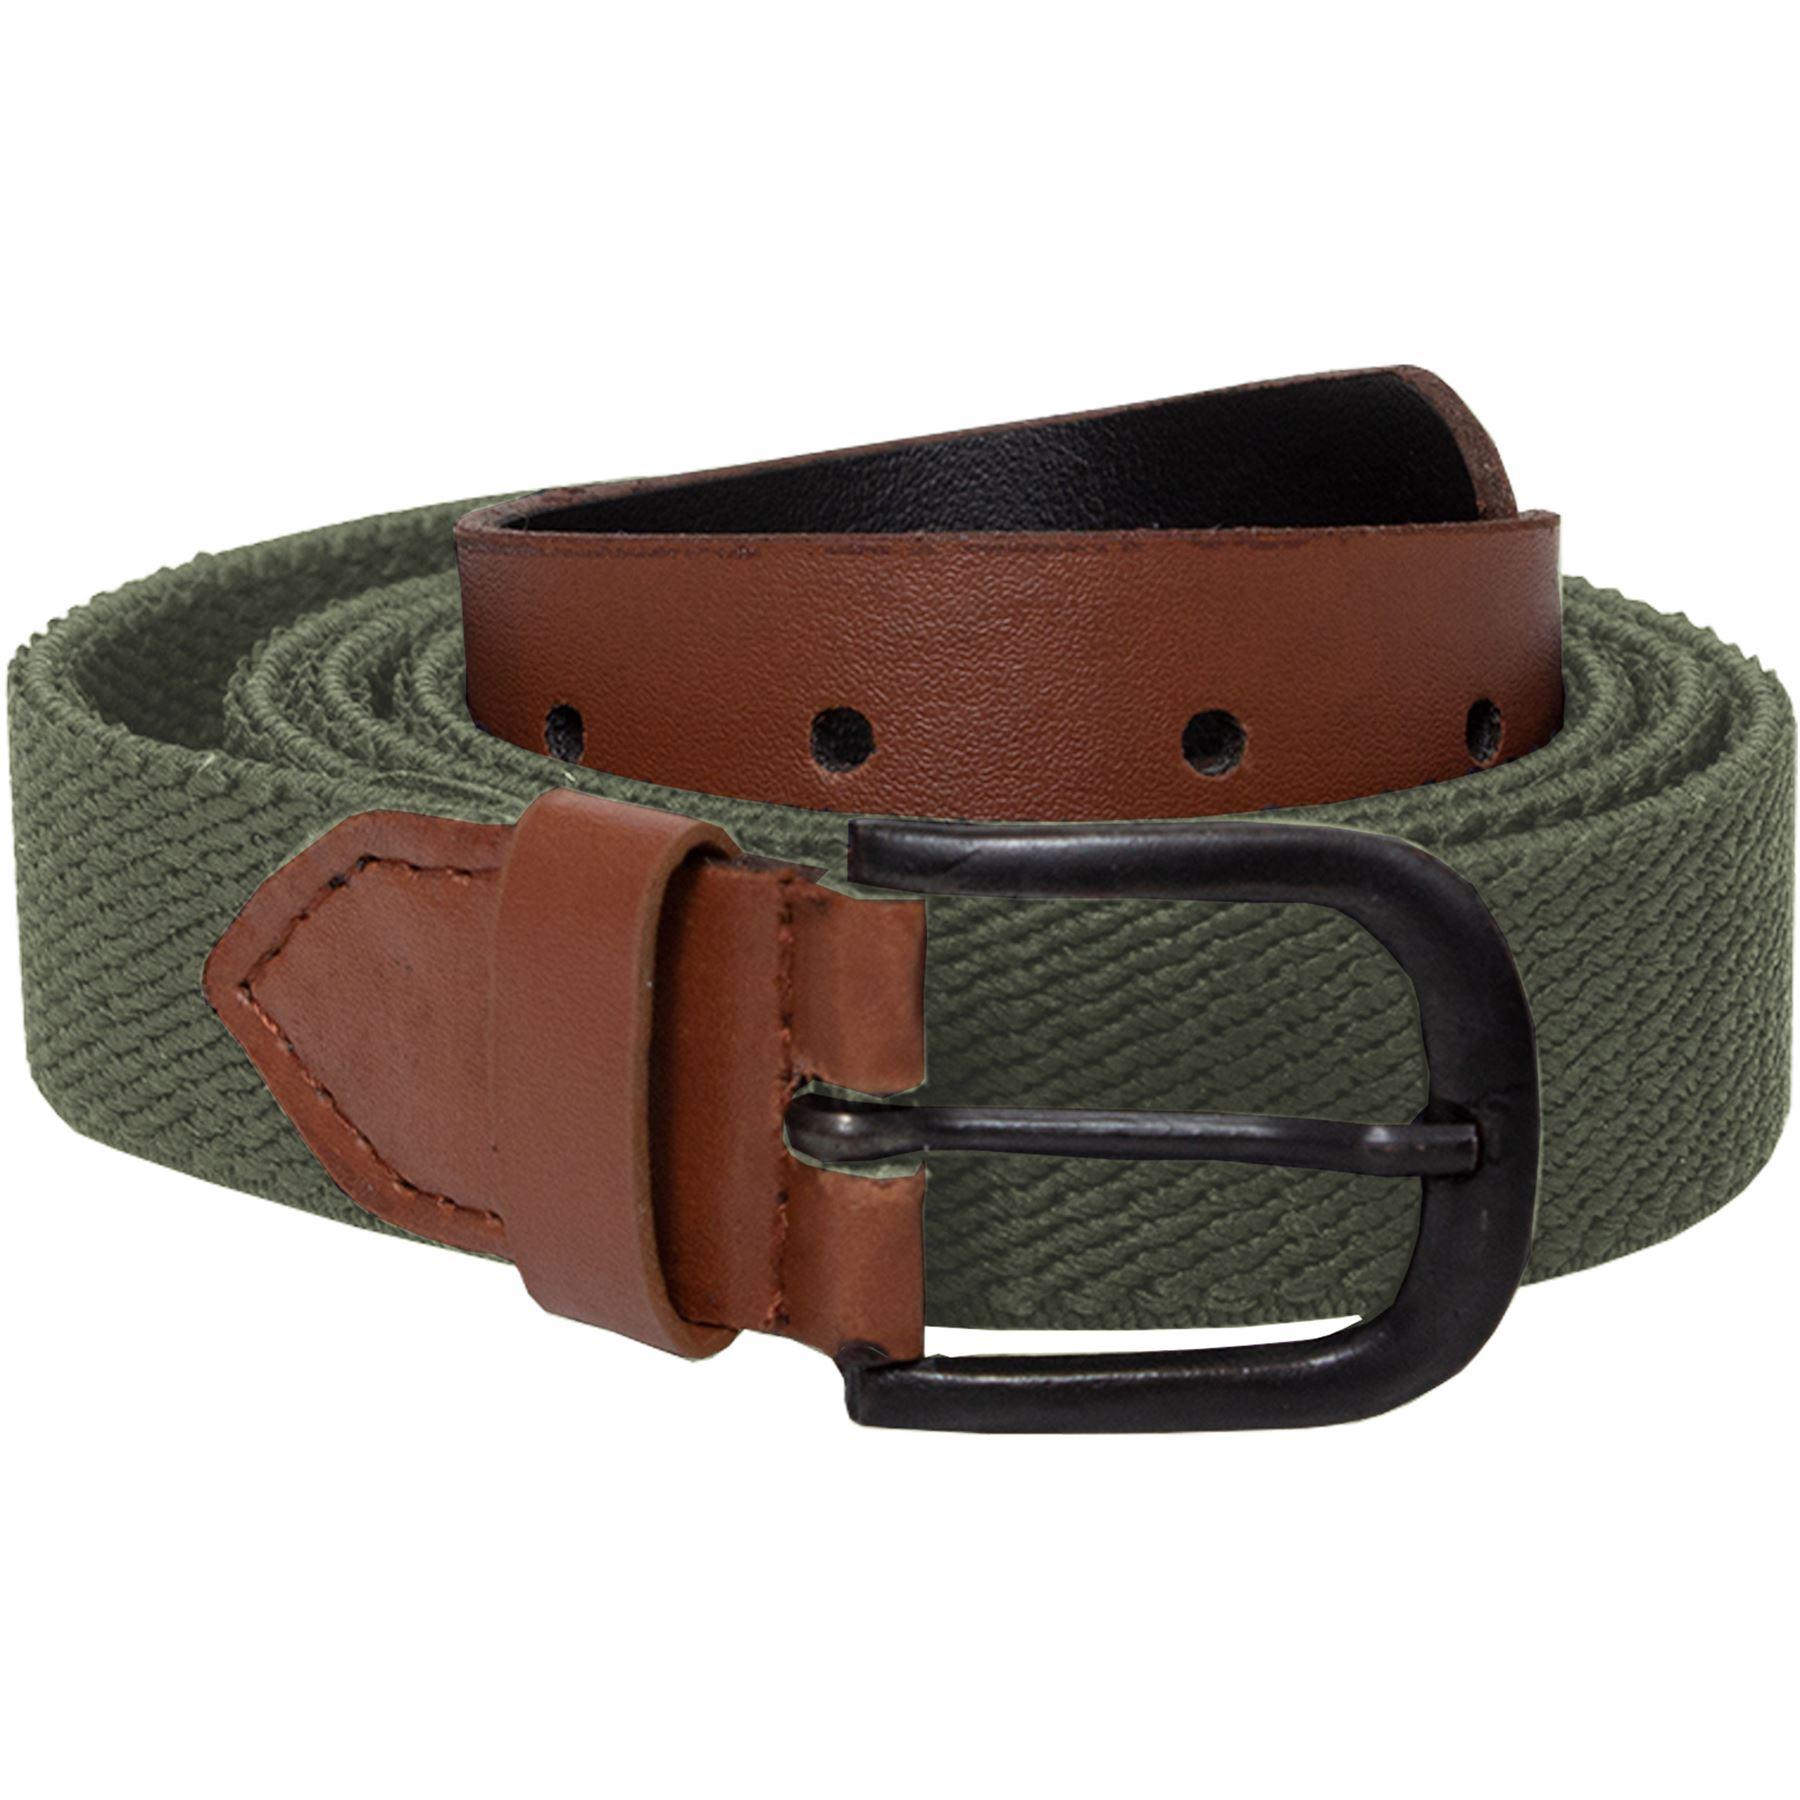 Mens-Ladies-Elasticated-Webbing-Belts-PU-Leather-Trim-Stretch-Canvas-Buckle-Belt Indexbild 13